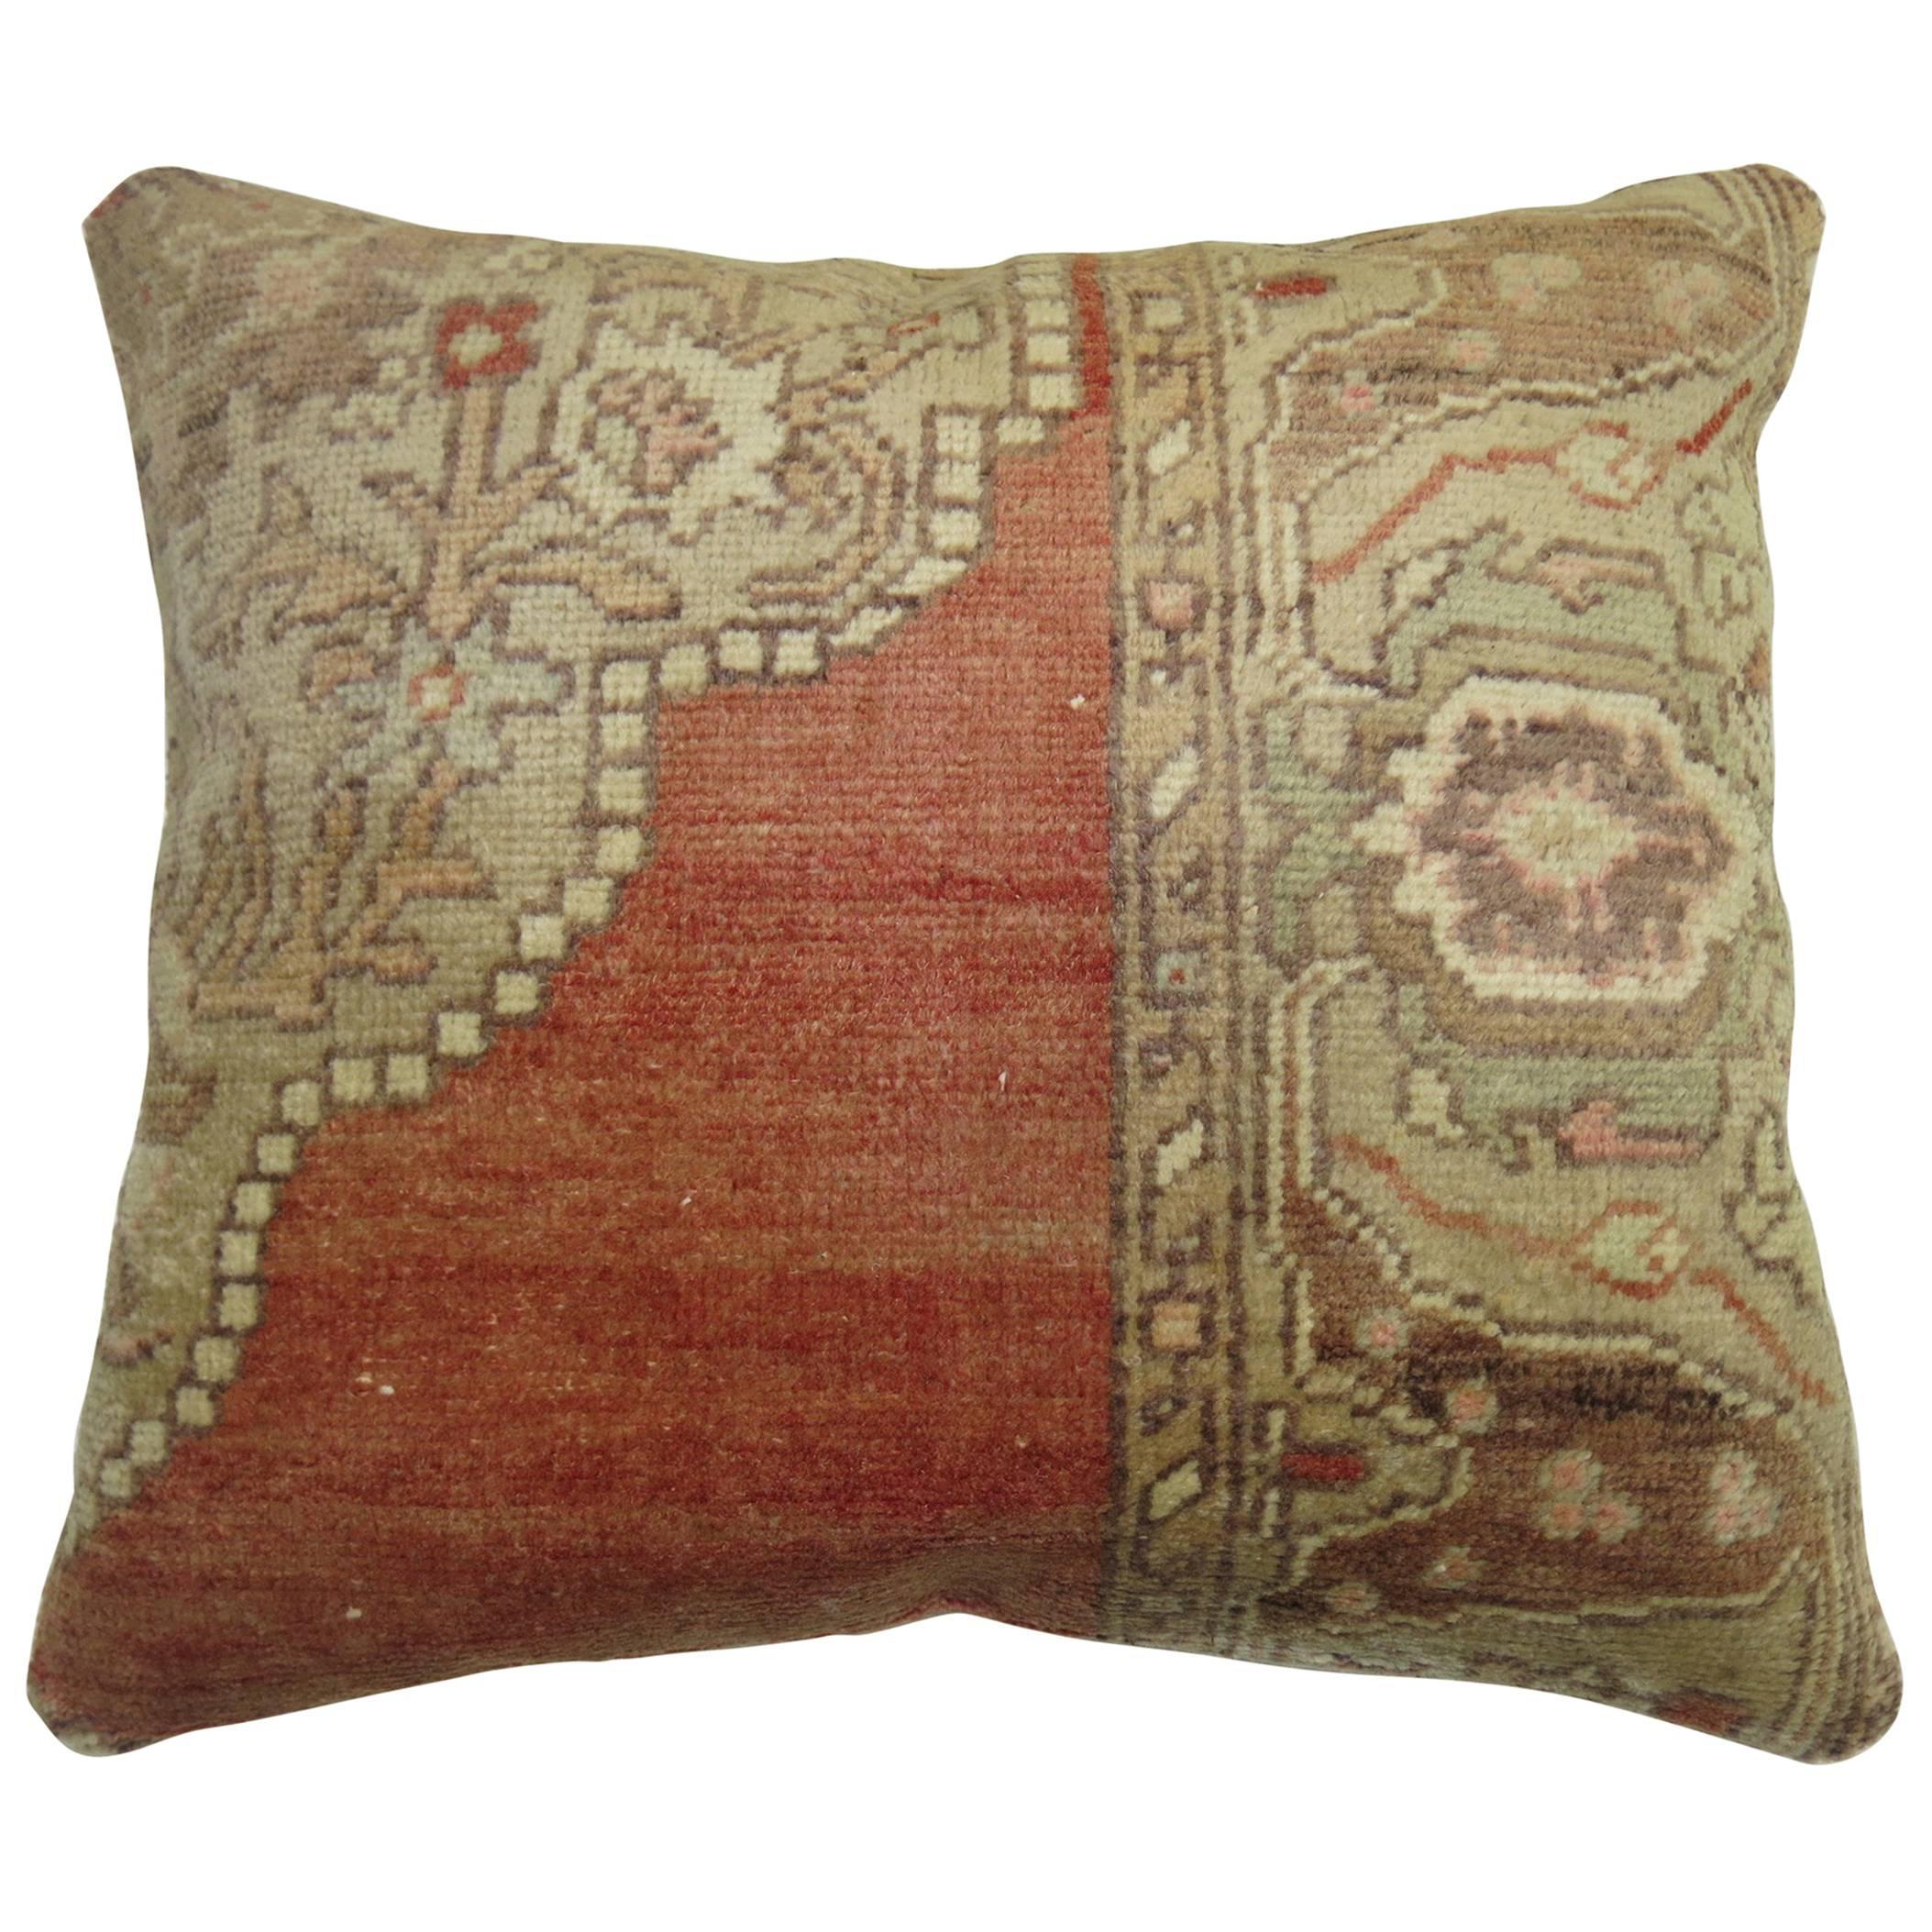 Tradtional Turkish Sivas Rug Pillow